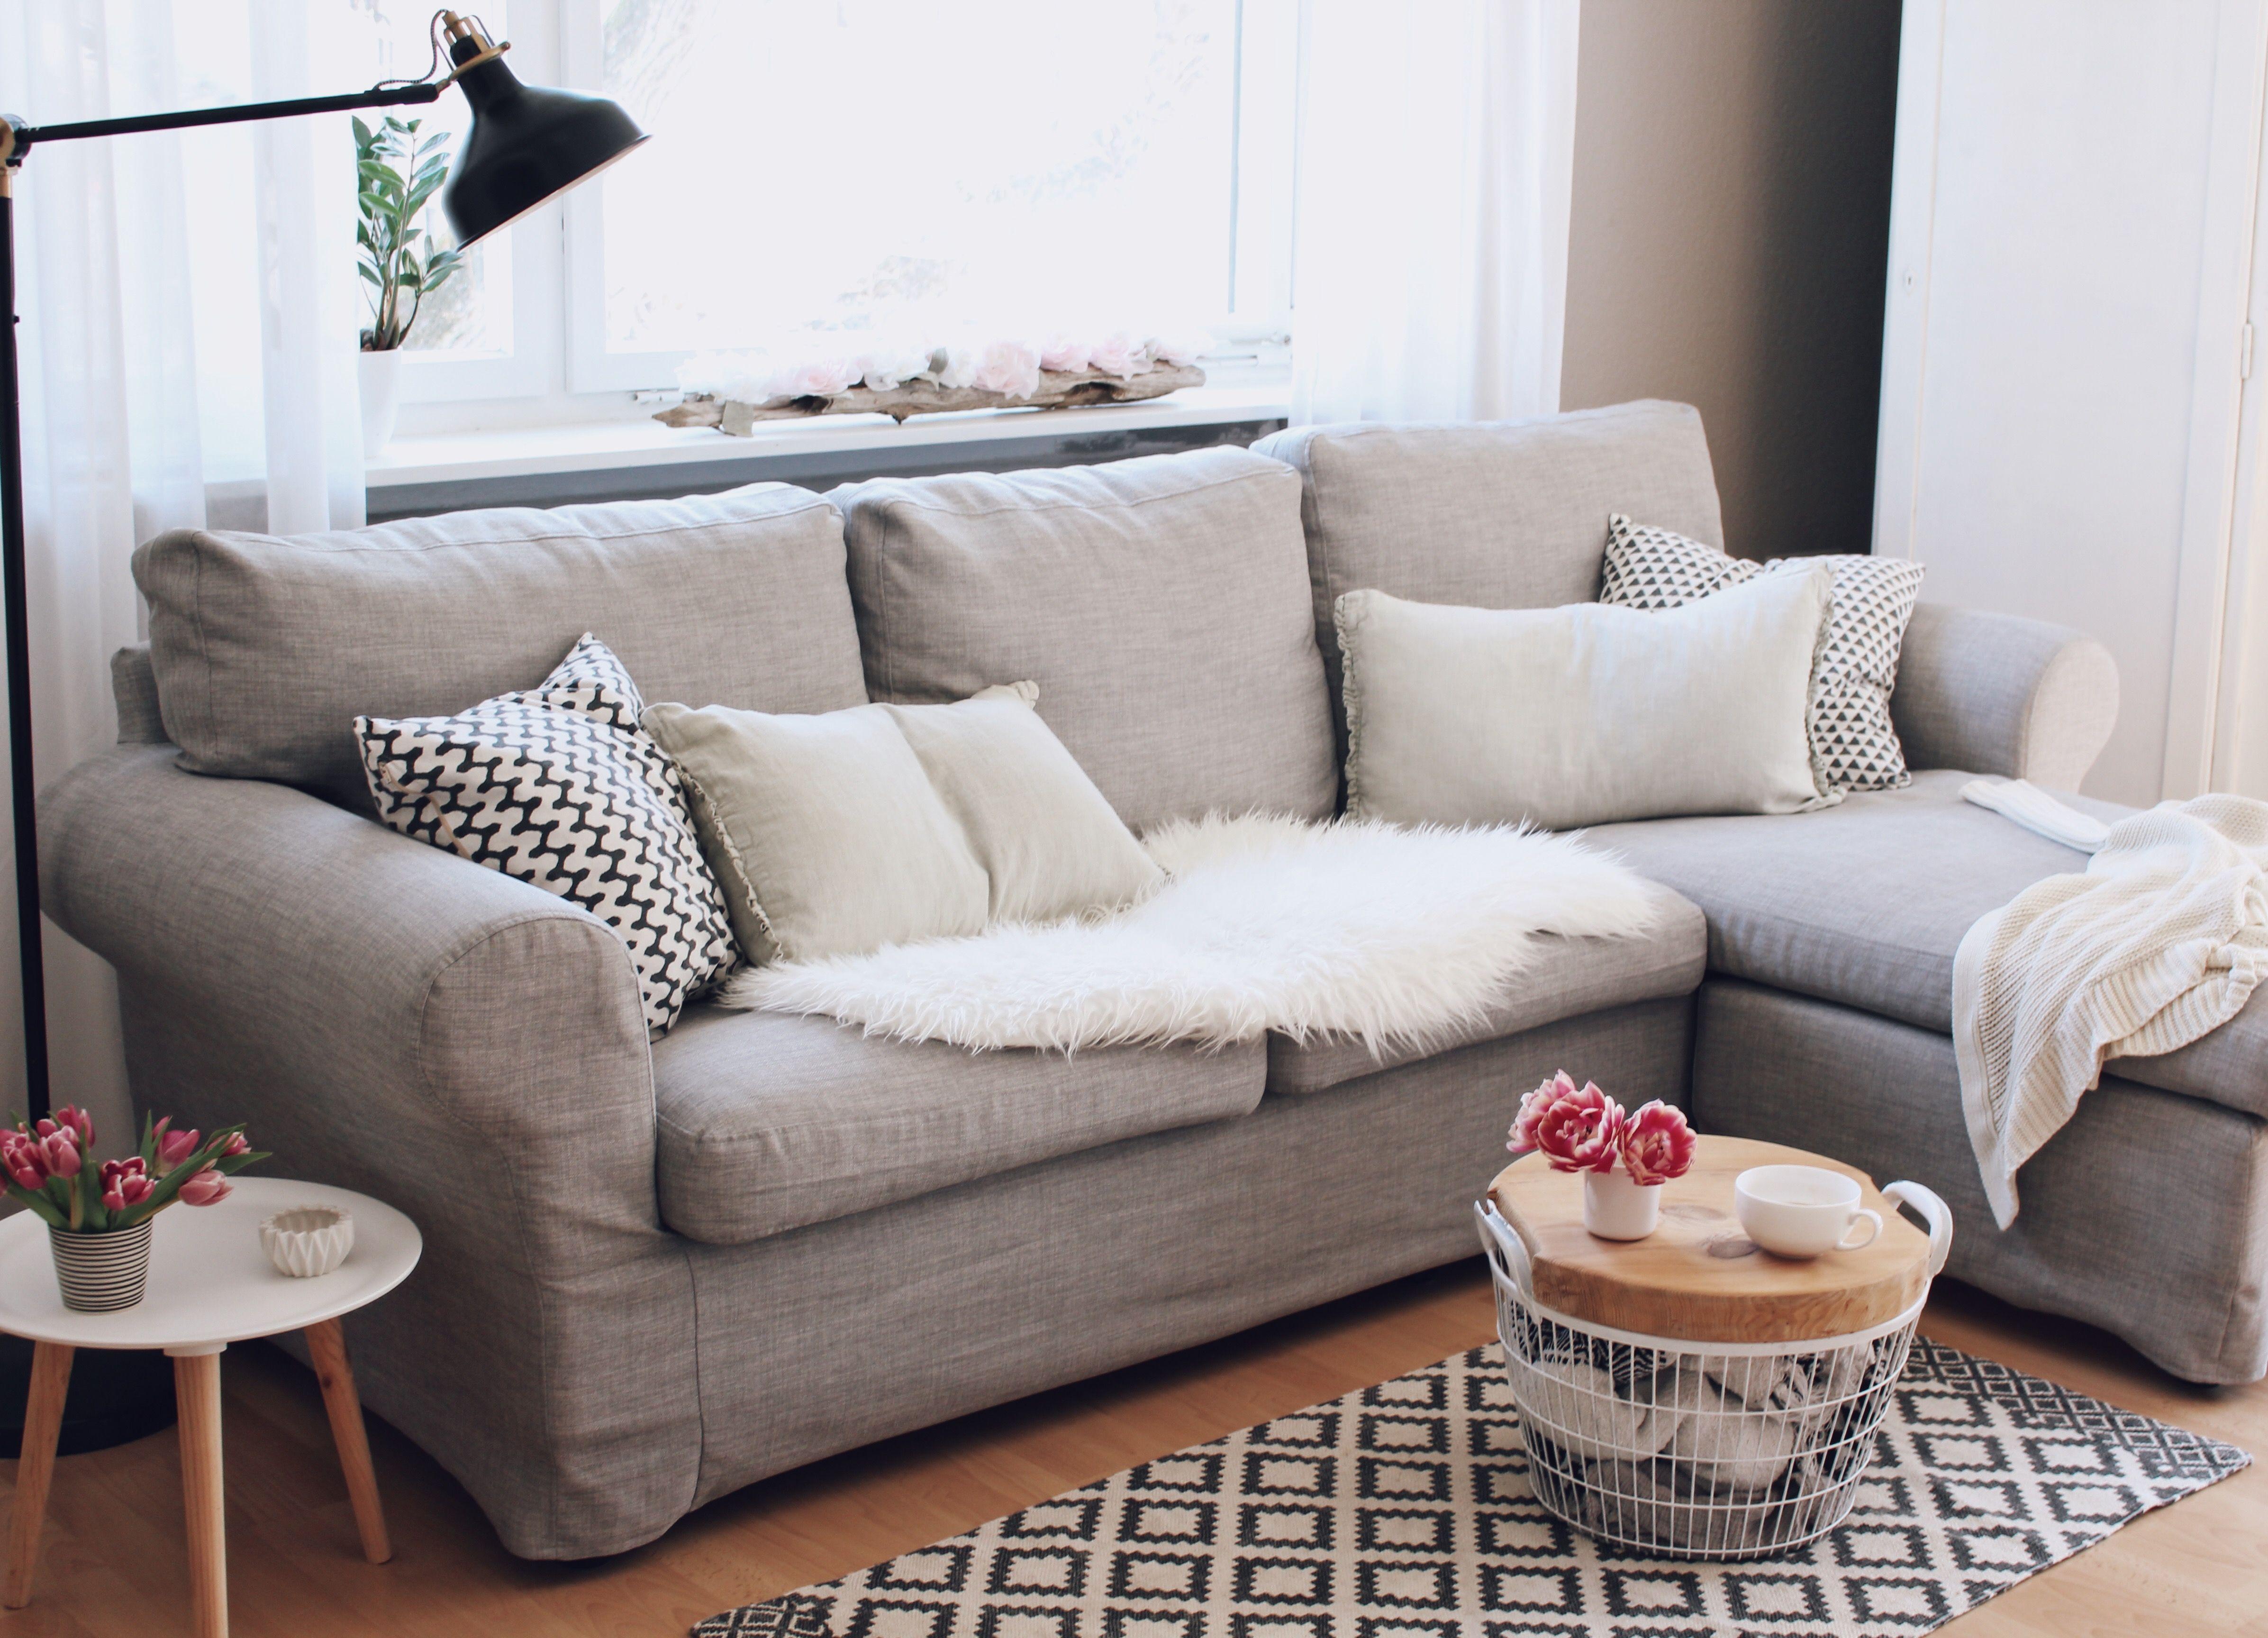 Ikea Ektorp Sectional Sofa In Kino Ash Sofa Slipcovers